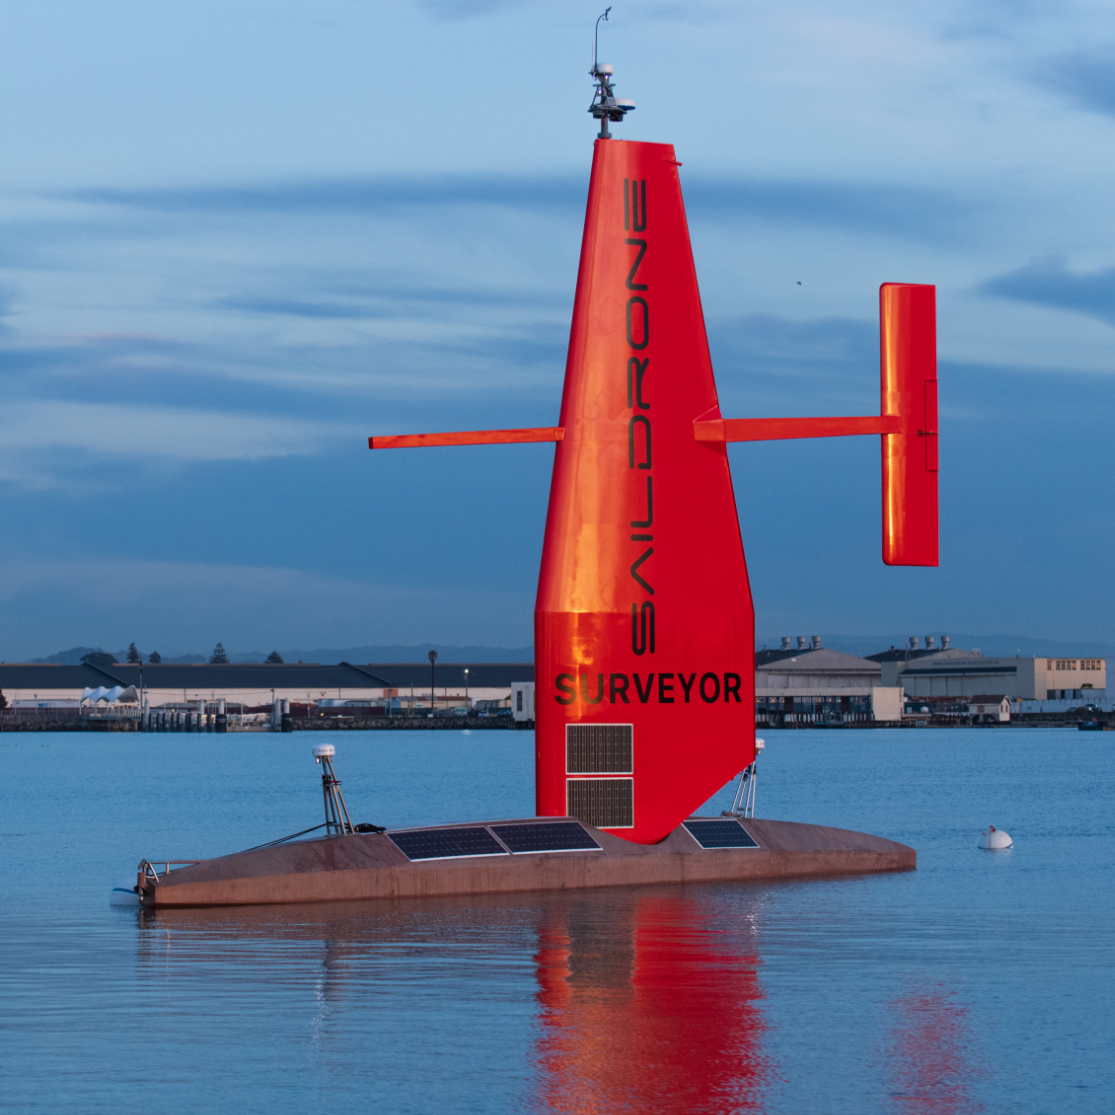 Saildrone Surveyor 72 foot autonomous vehicle